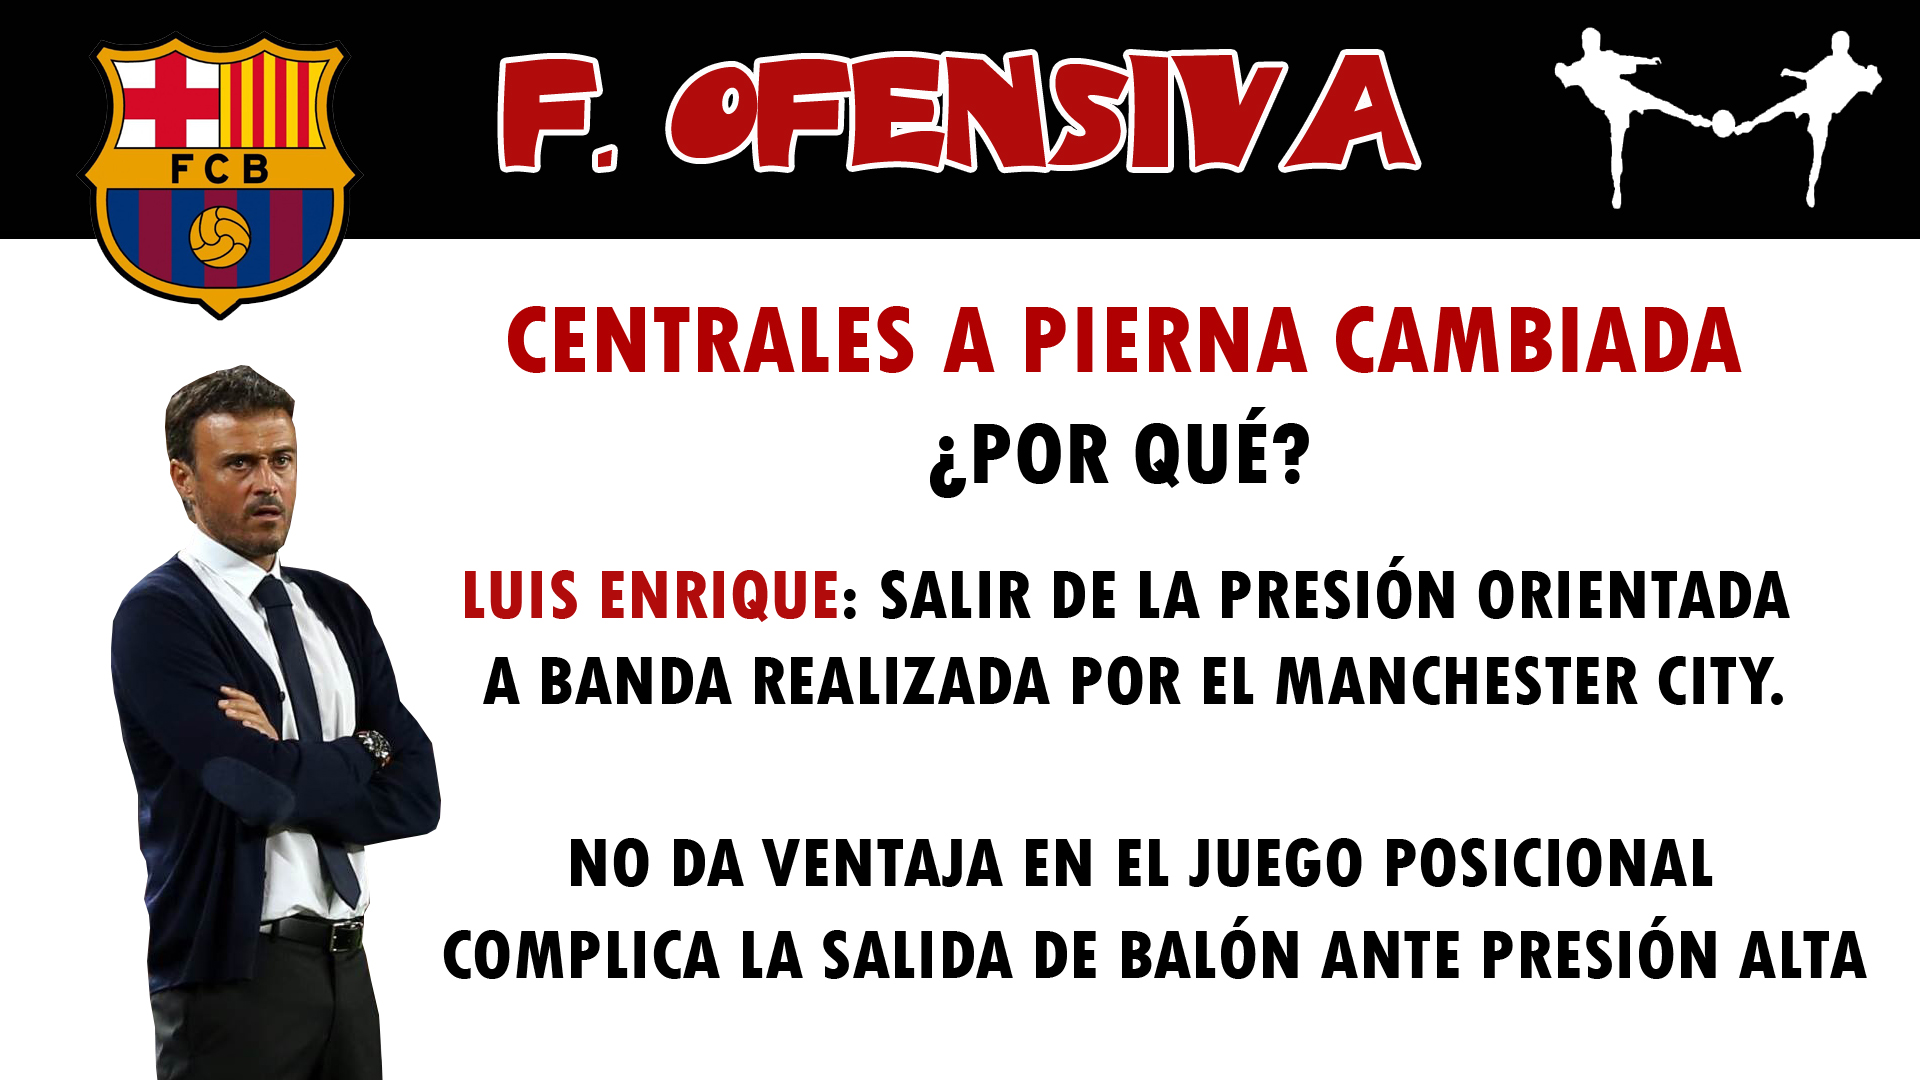 futbolcarrasco luis enrique fc barcelona champions manchester city analisis tactico